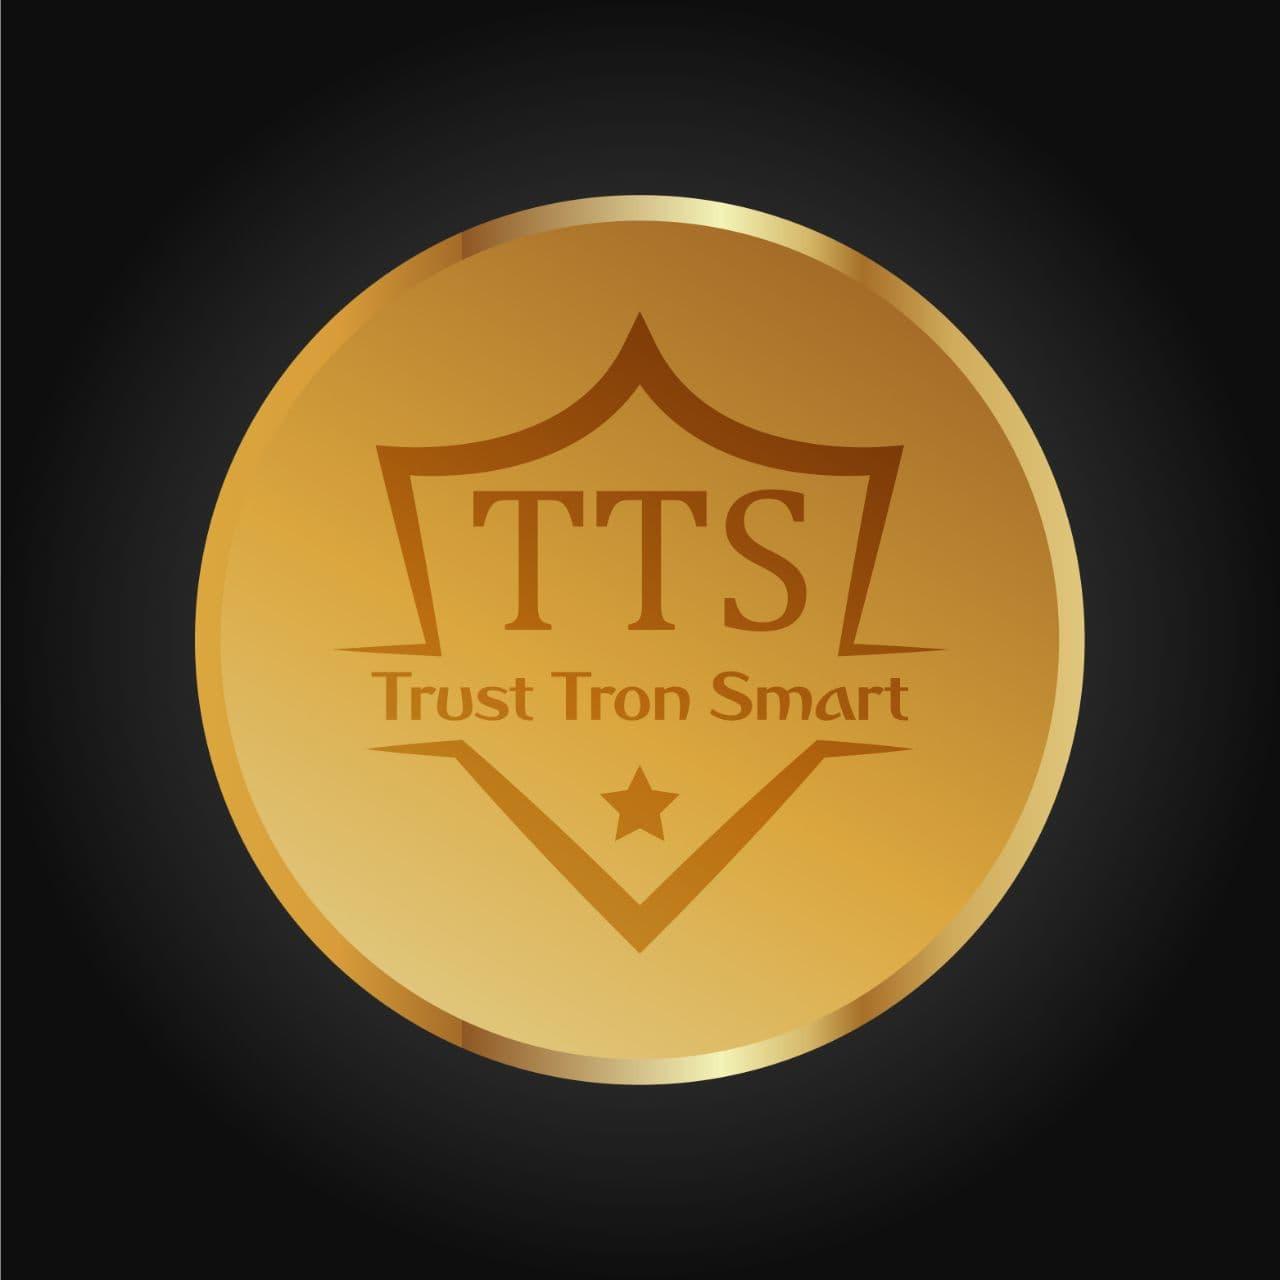 Trust Tron Smart - Bank logo